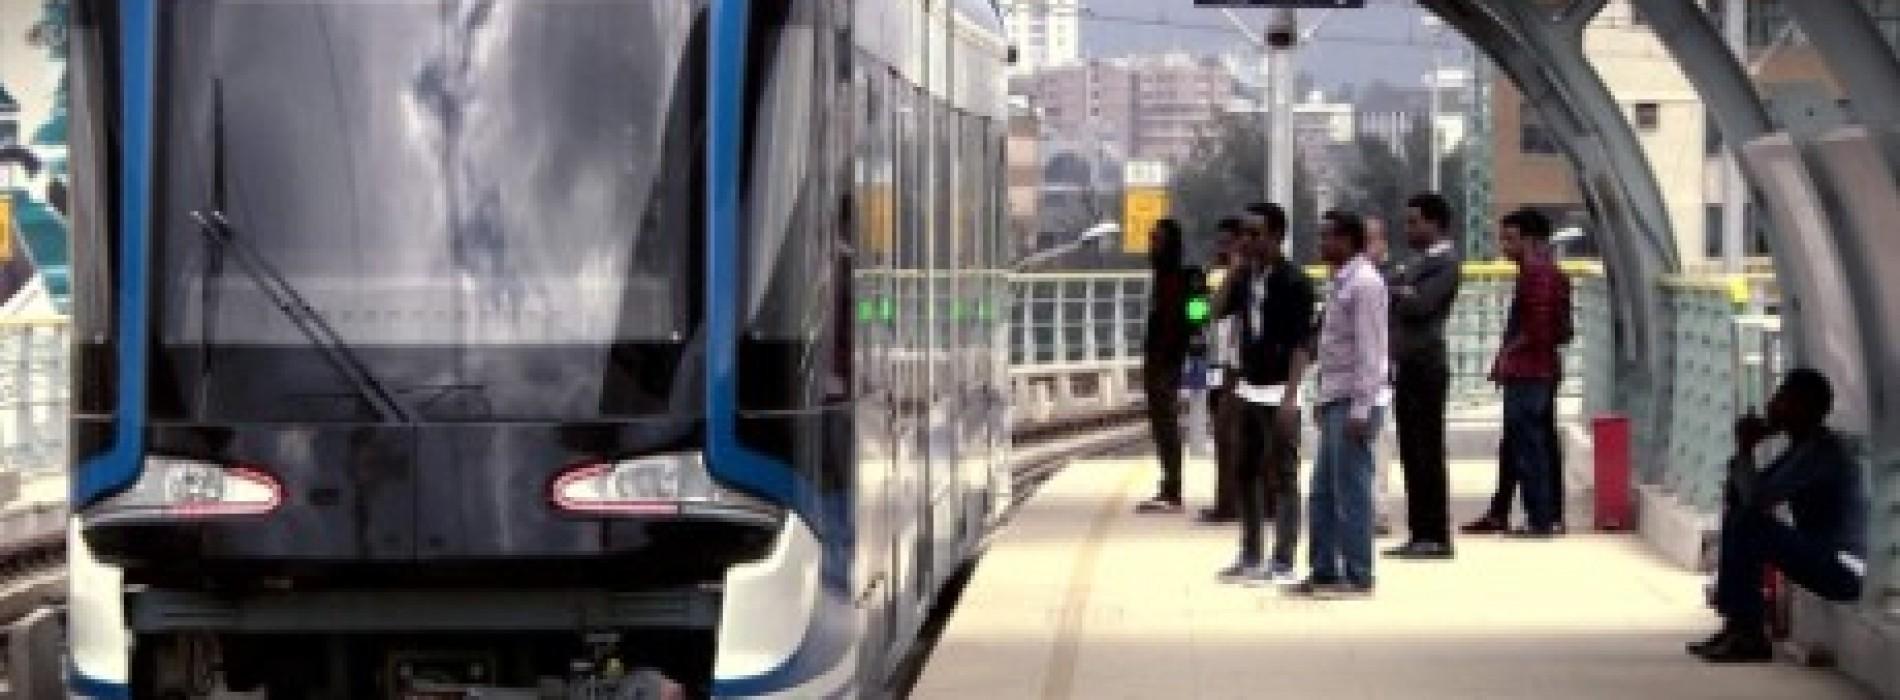 Apre in Etiopia la prima metro dell'Africa sub-sahariana